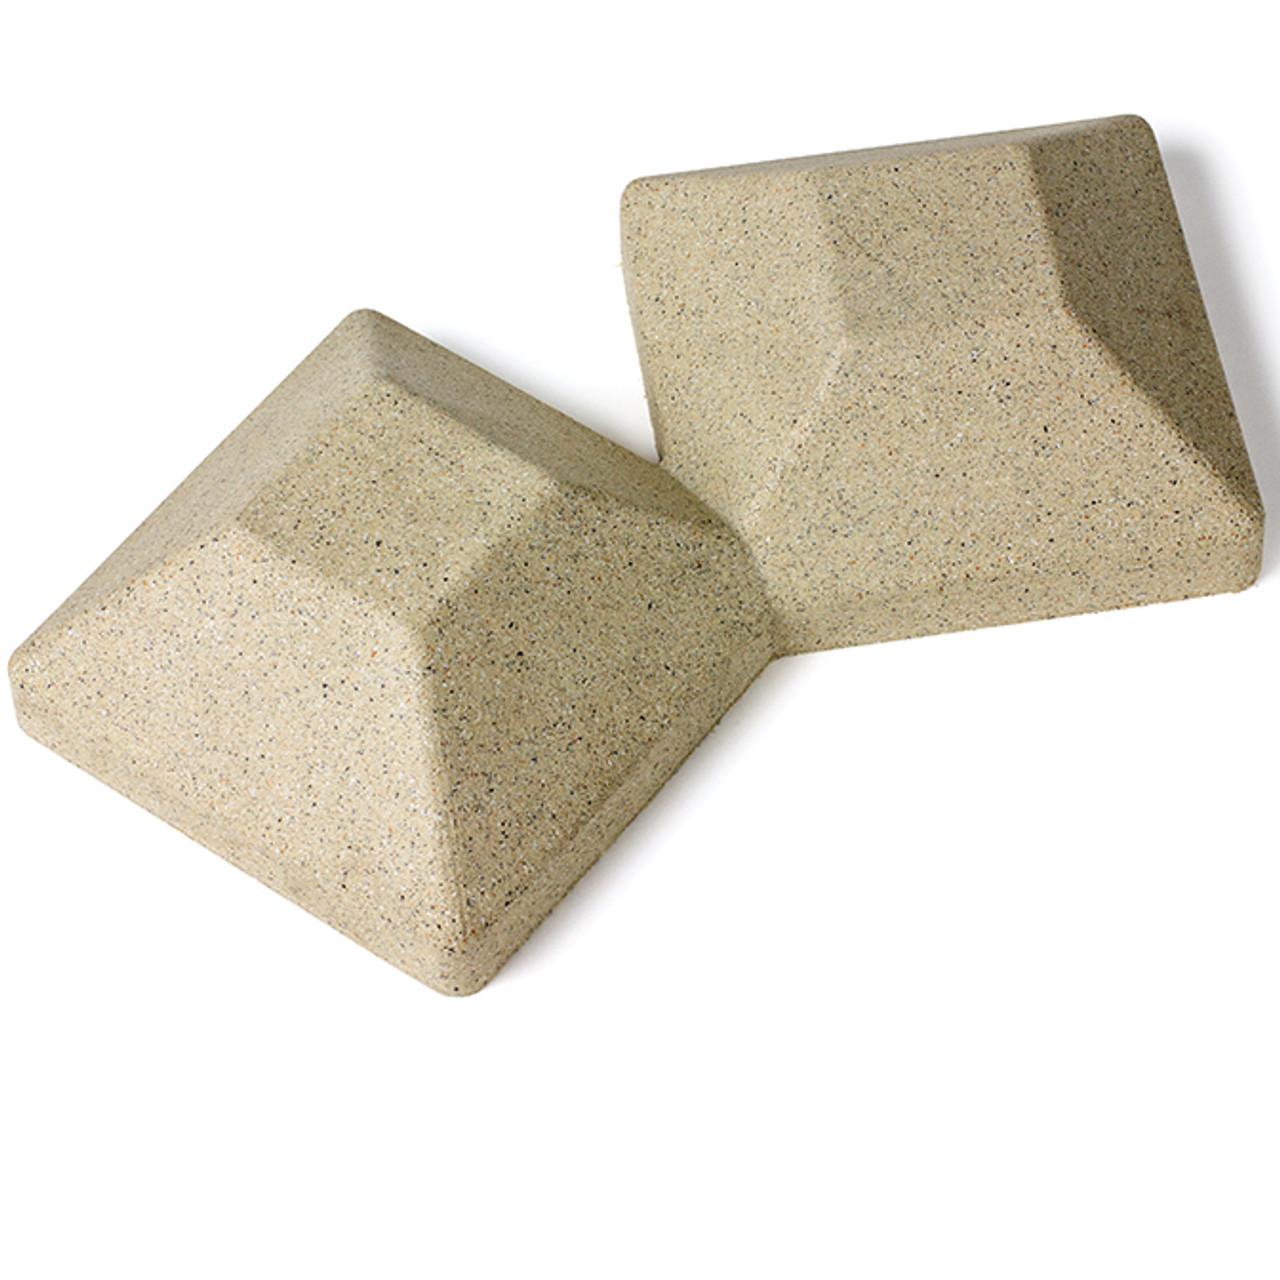 5 x 5 Beige Granite 45-Degree Double Cap for Bufftech Allegheny & Sherwood Molded Fence Styles